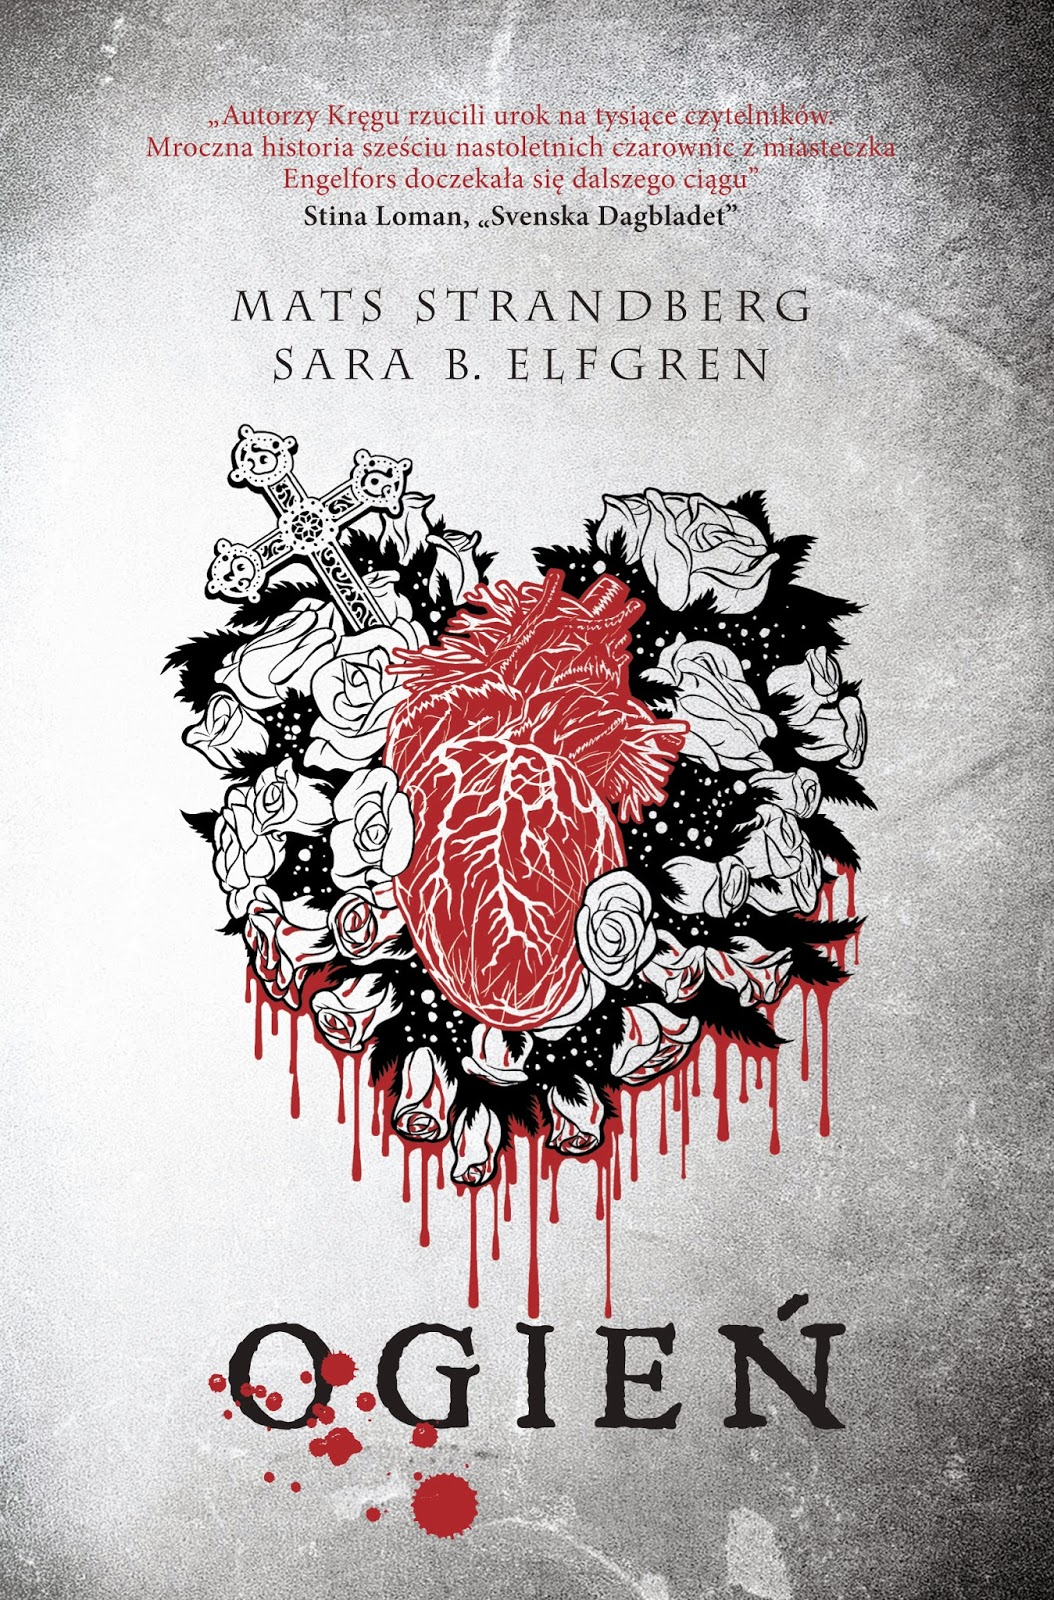 Ogien Mats Stracdberg Sara B Elfgren Recenzja Ksiazki